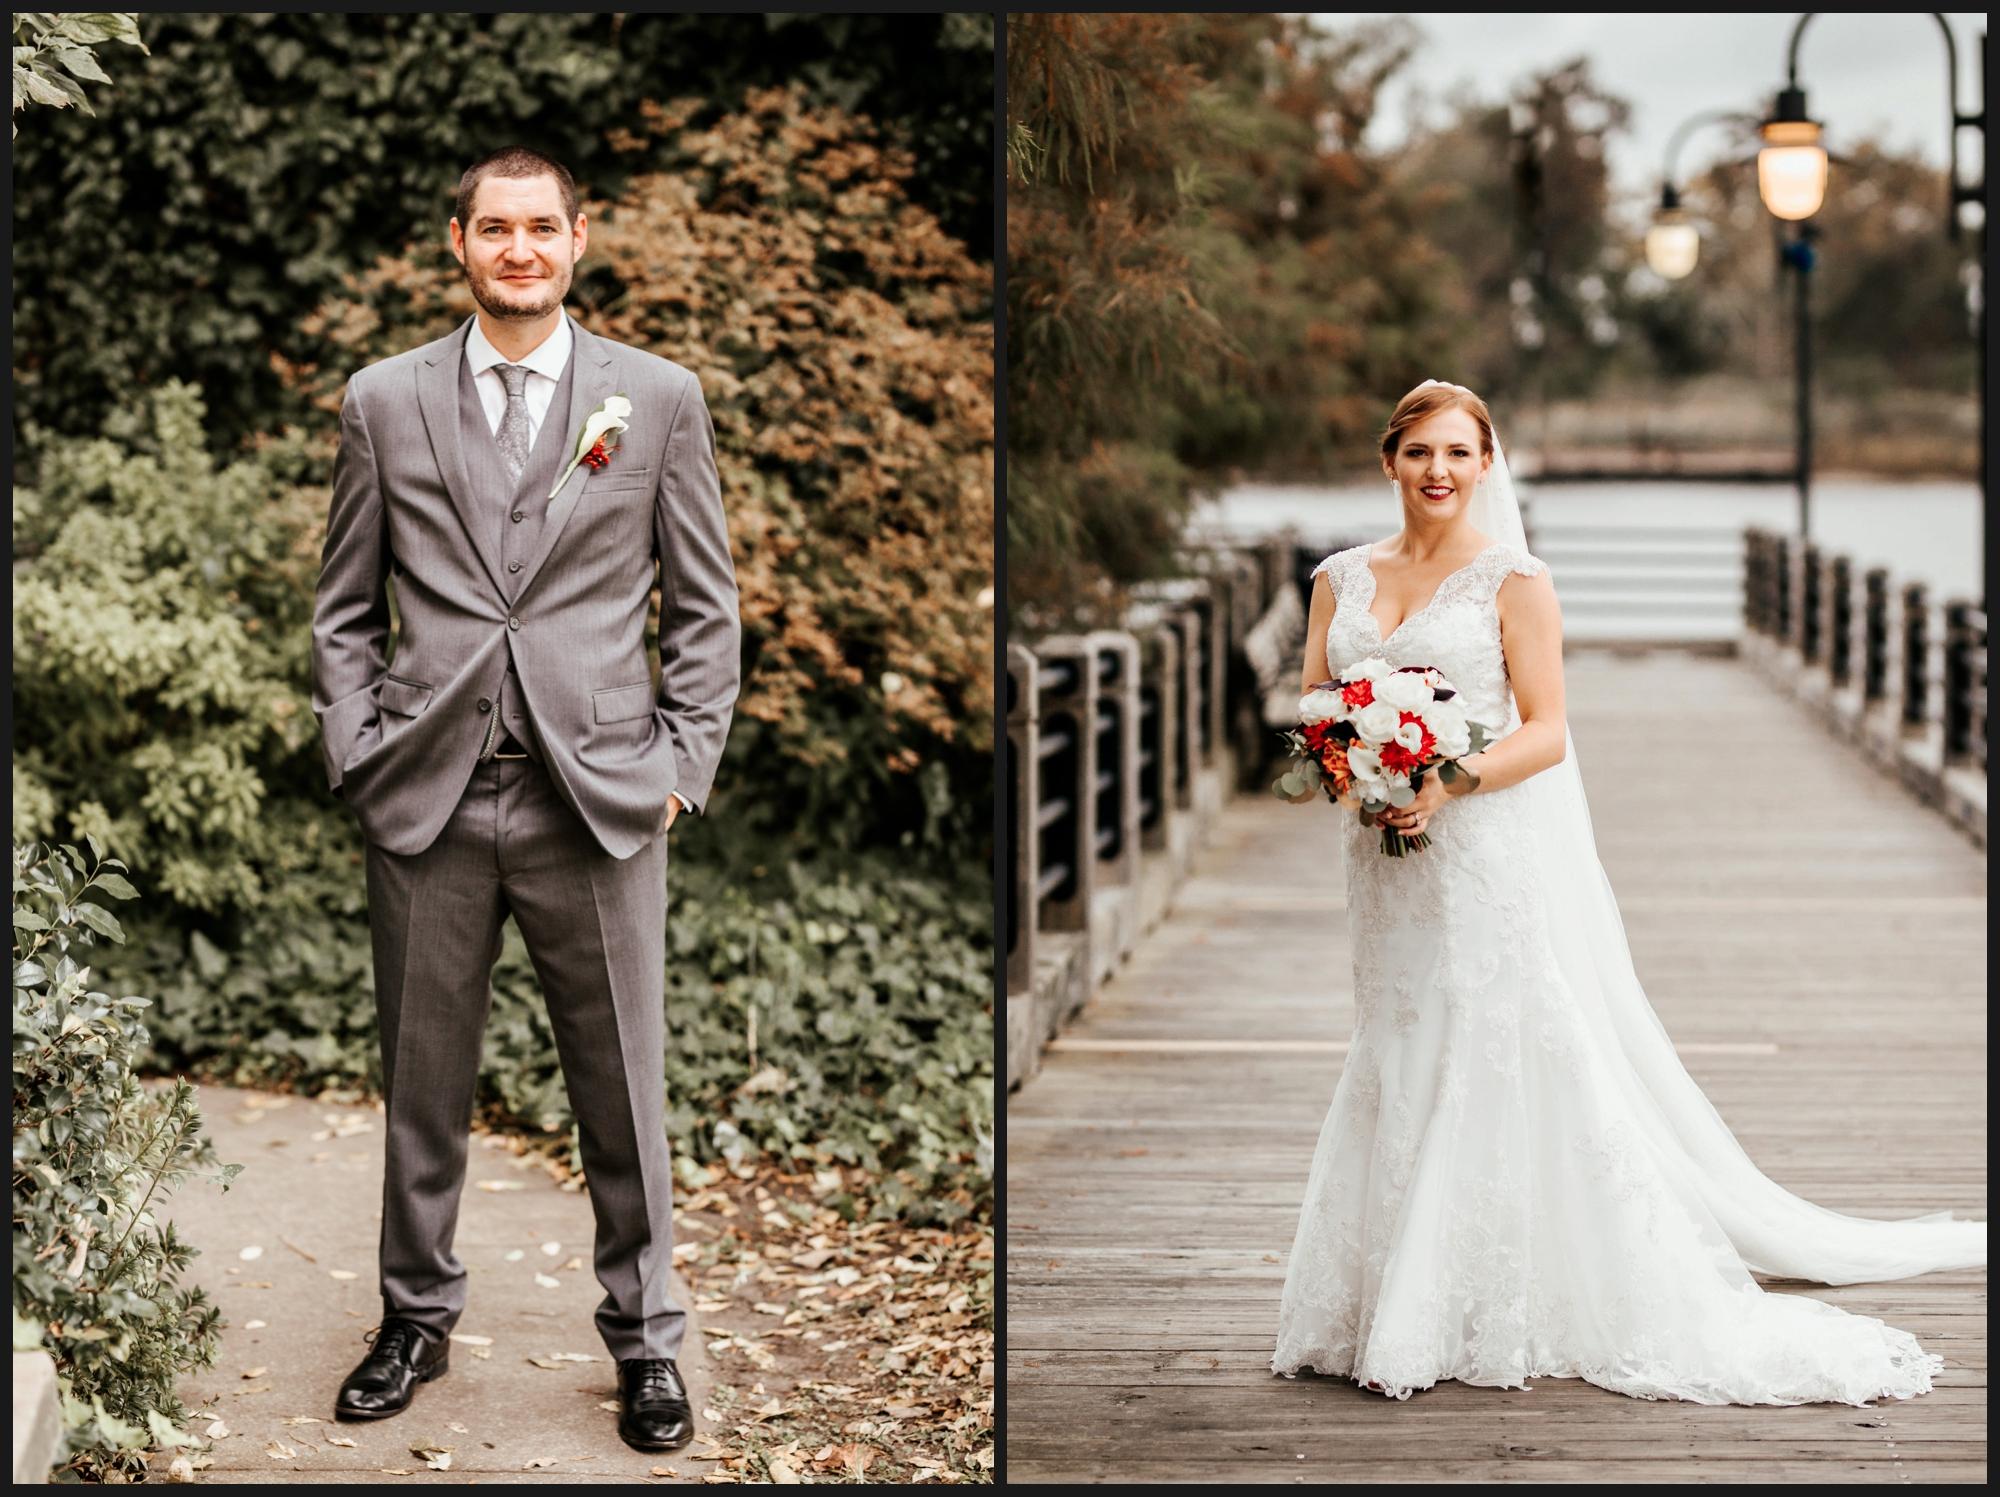 Orlando-Wedding-Photographer-destination-wedding-photographer-florida-wedding-photographer-bohemian-wedding-photographer_0558.jpg